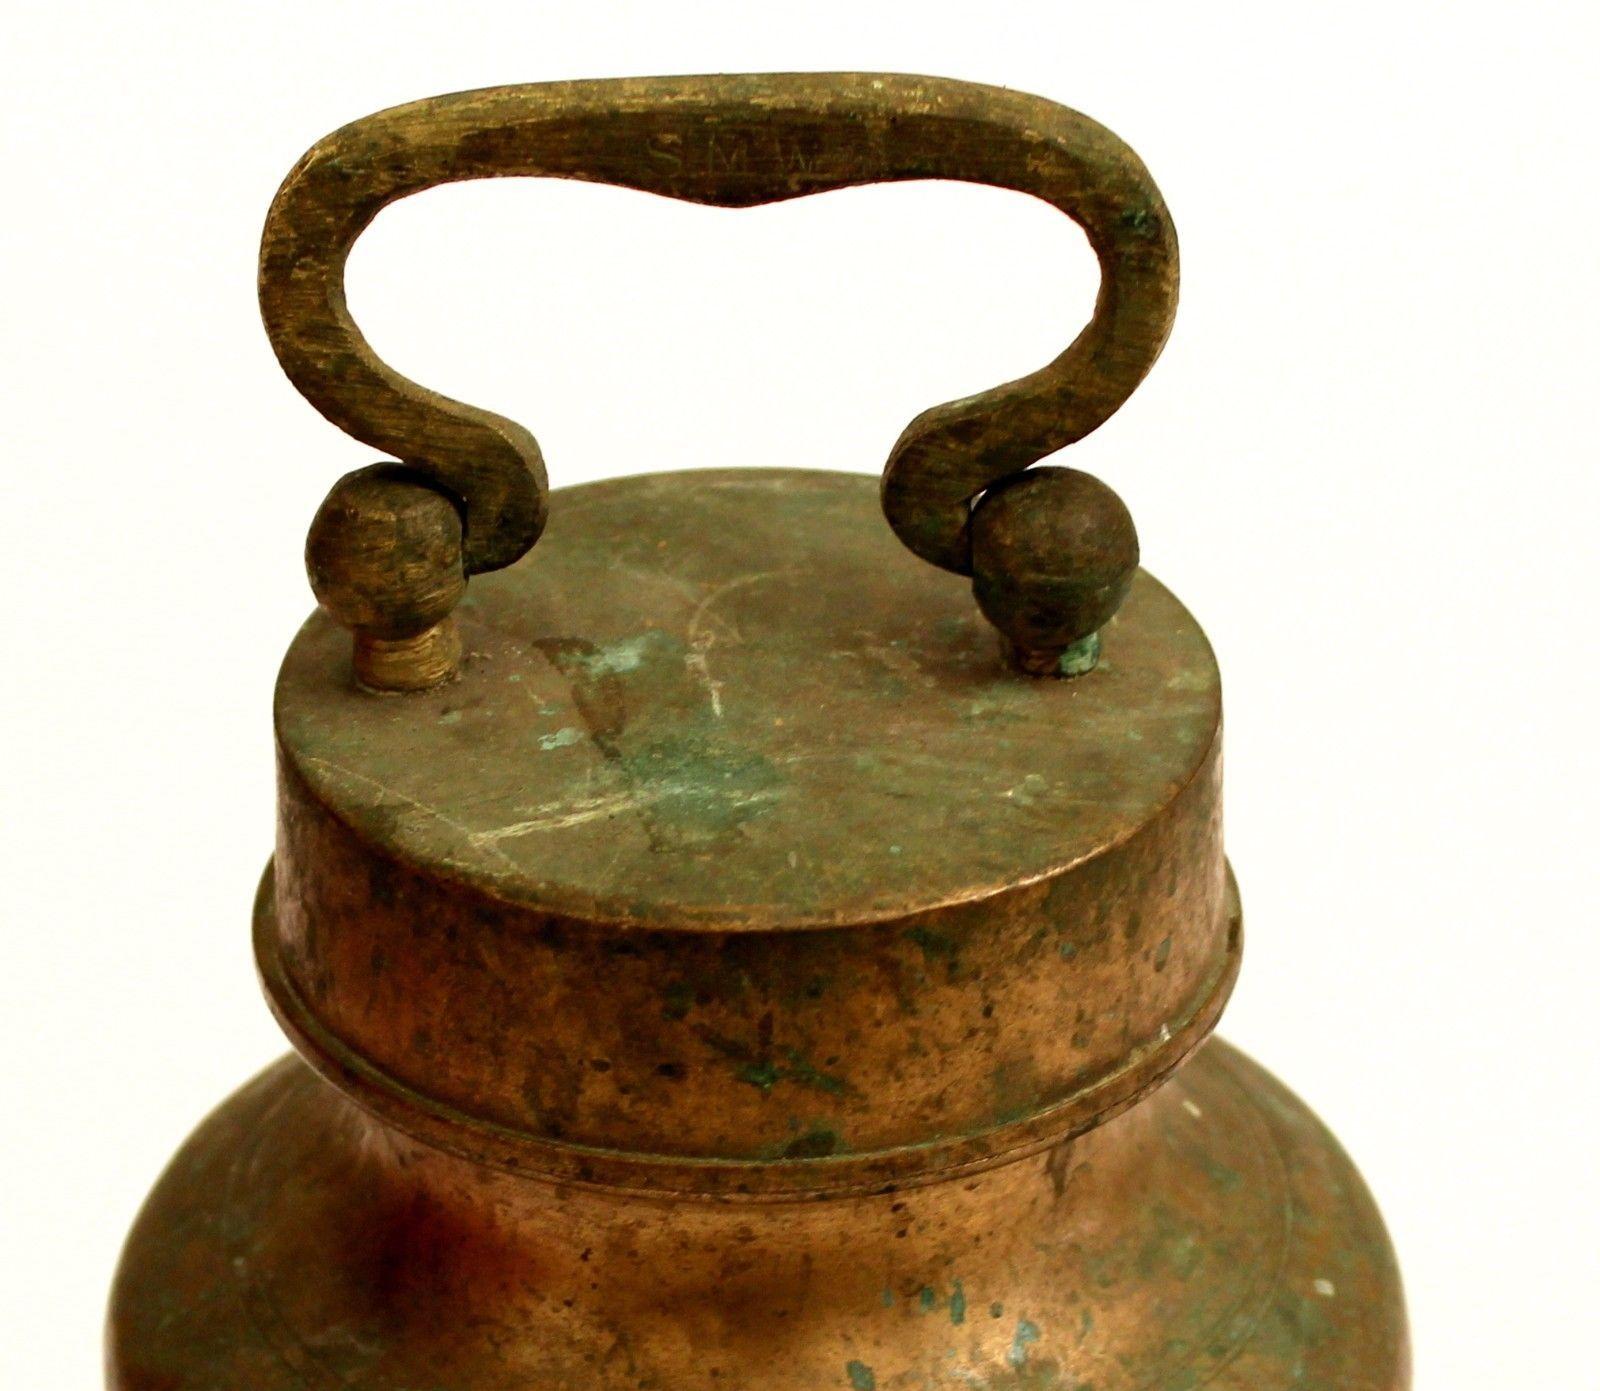 Holy water brass lid pot gangajal storing round handle bellly antique vintage..